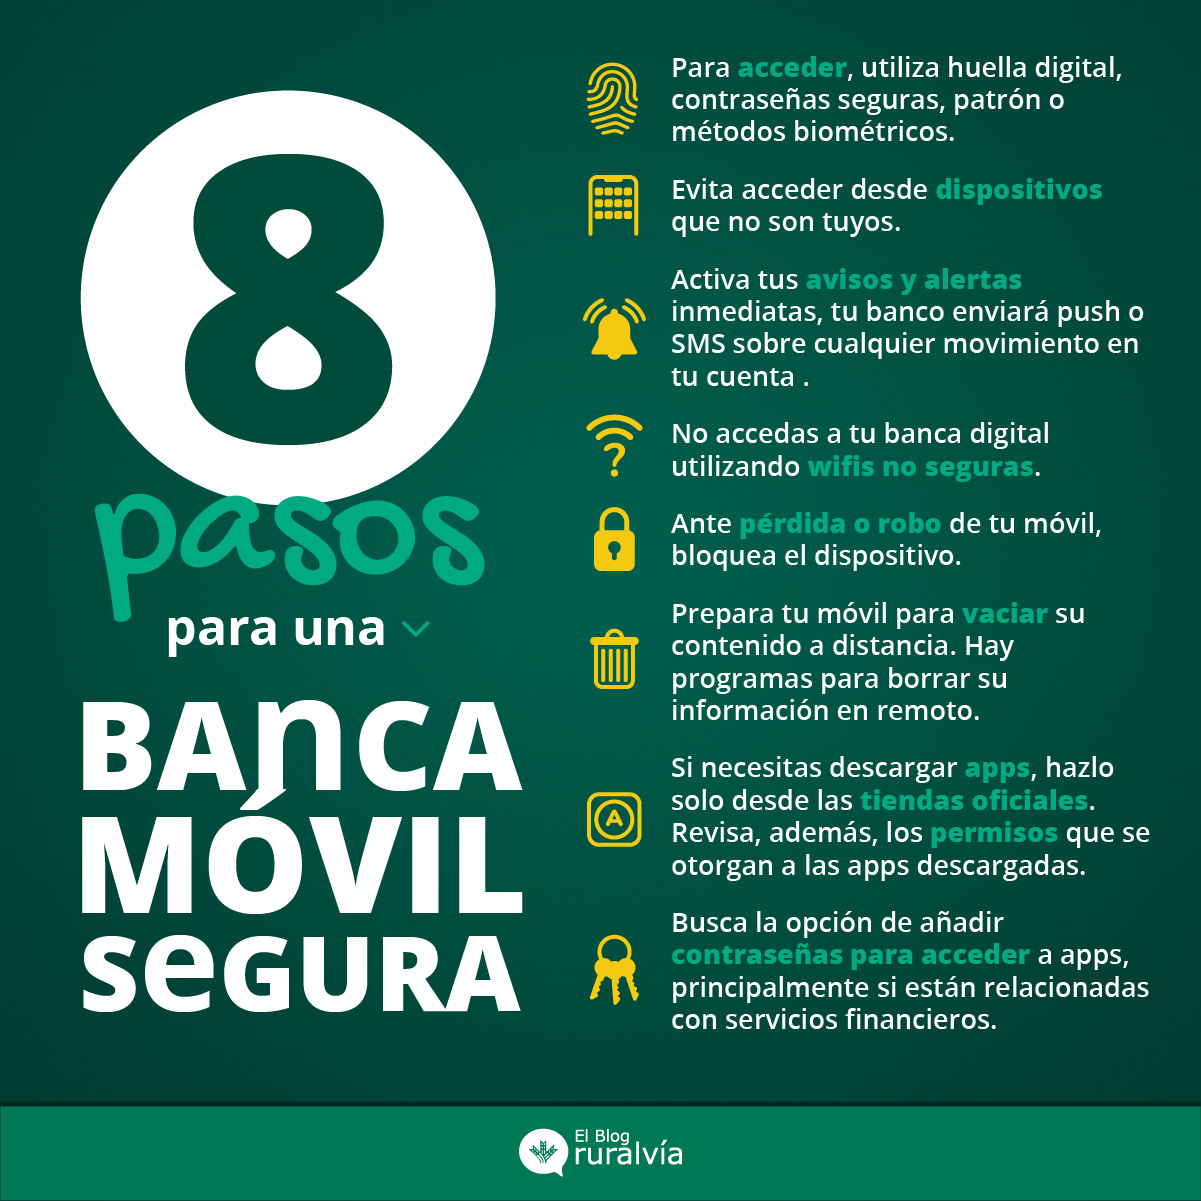 Prepara tu banca móvil para mantenerla segura